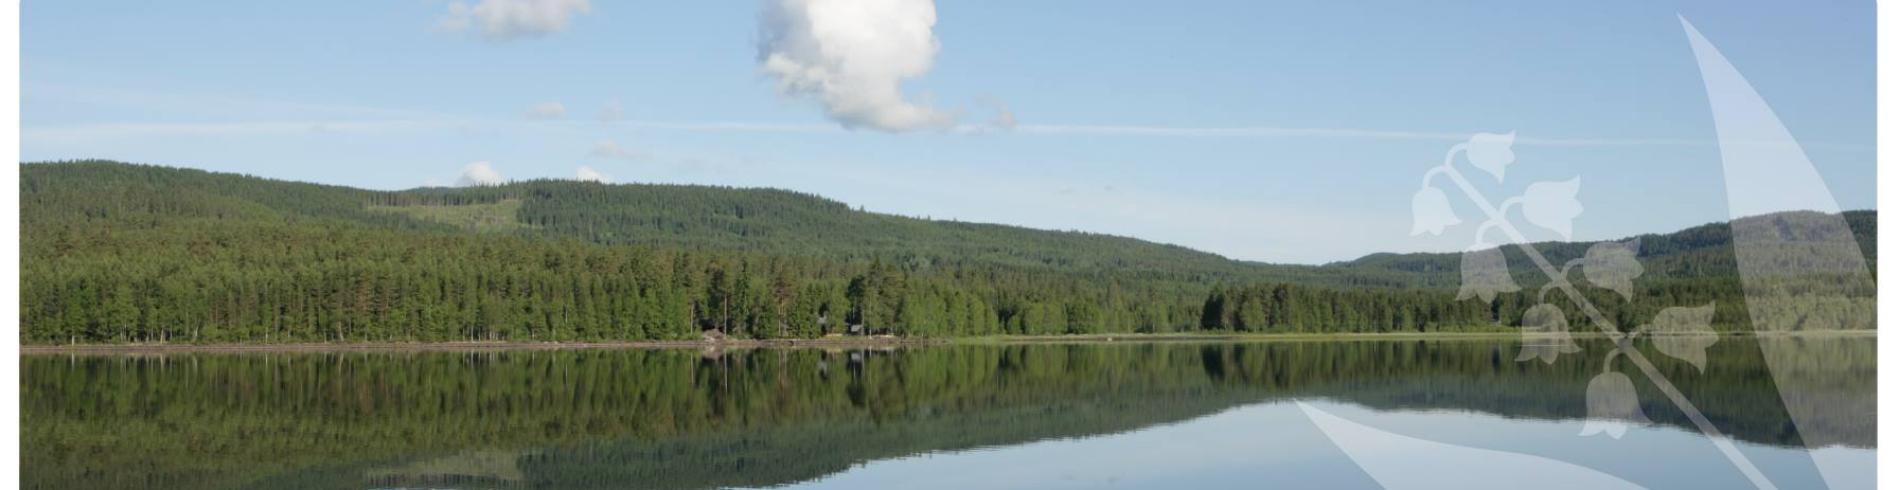 Lunner kommune cover image